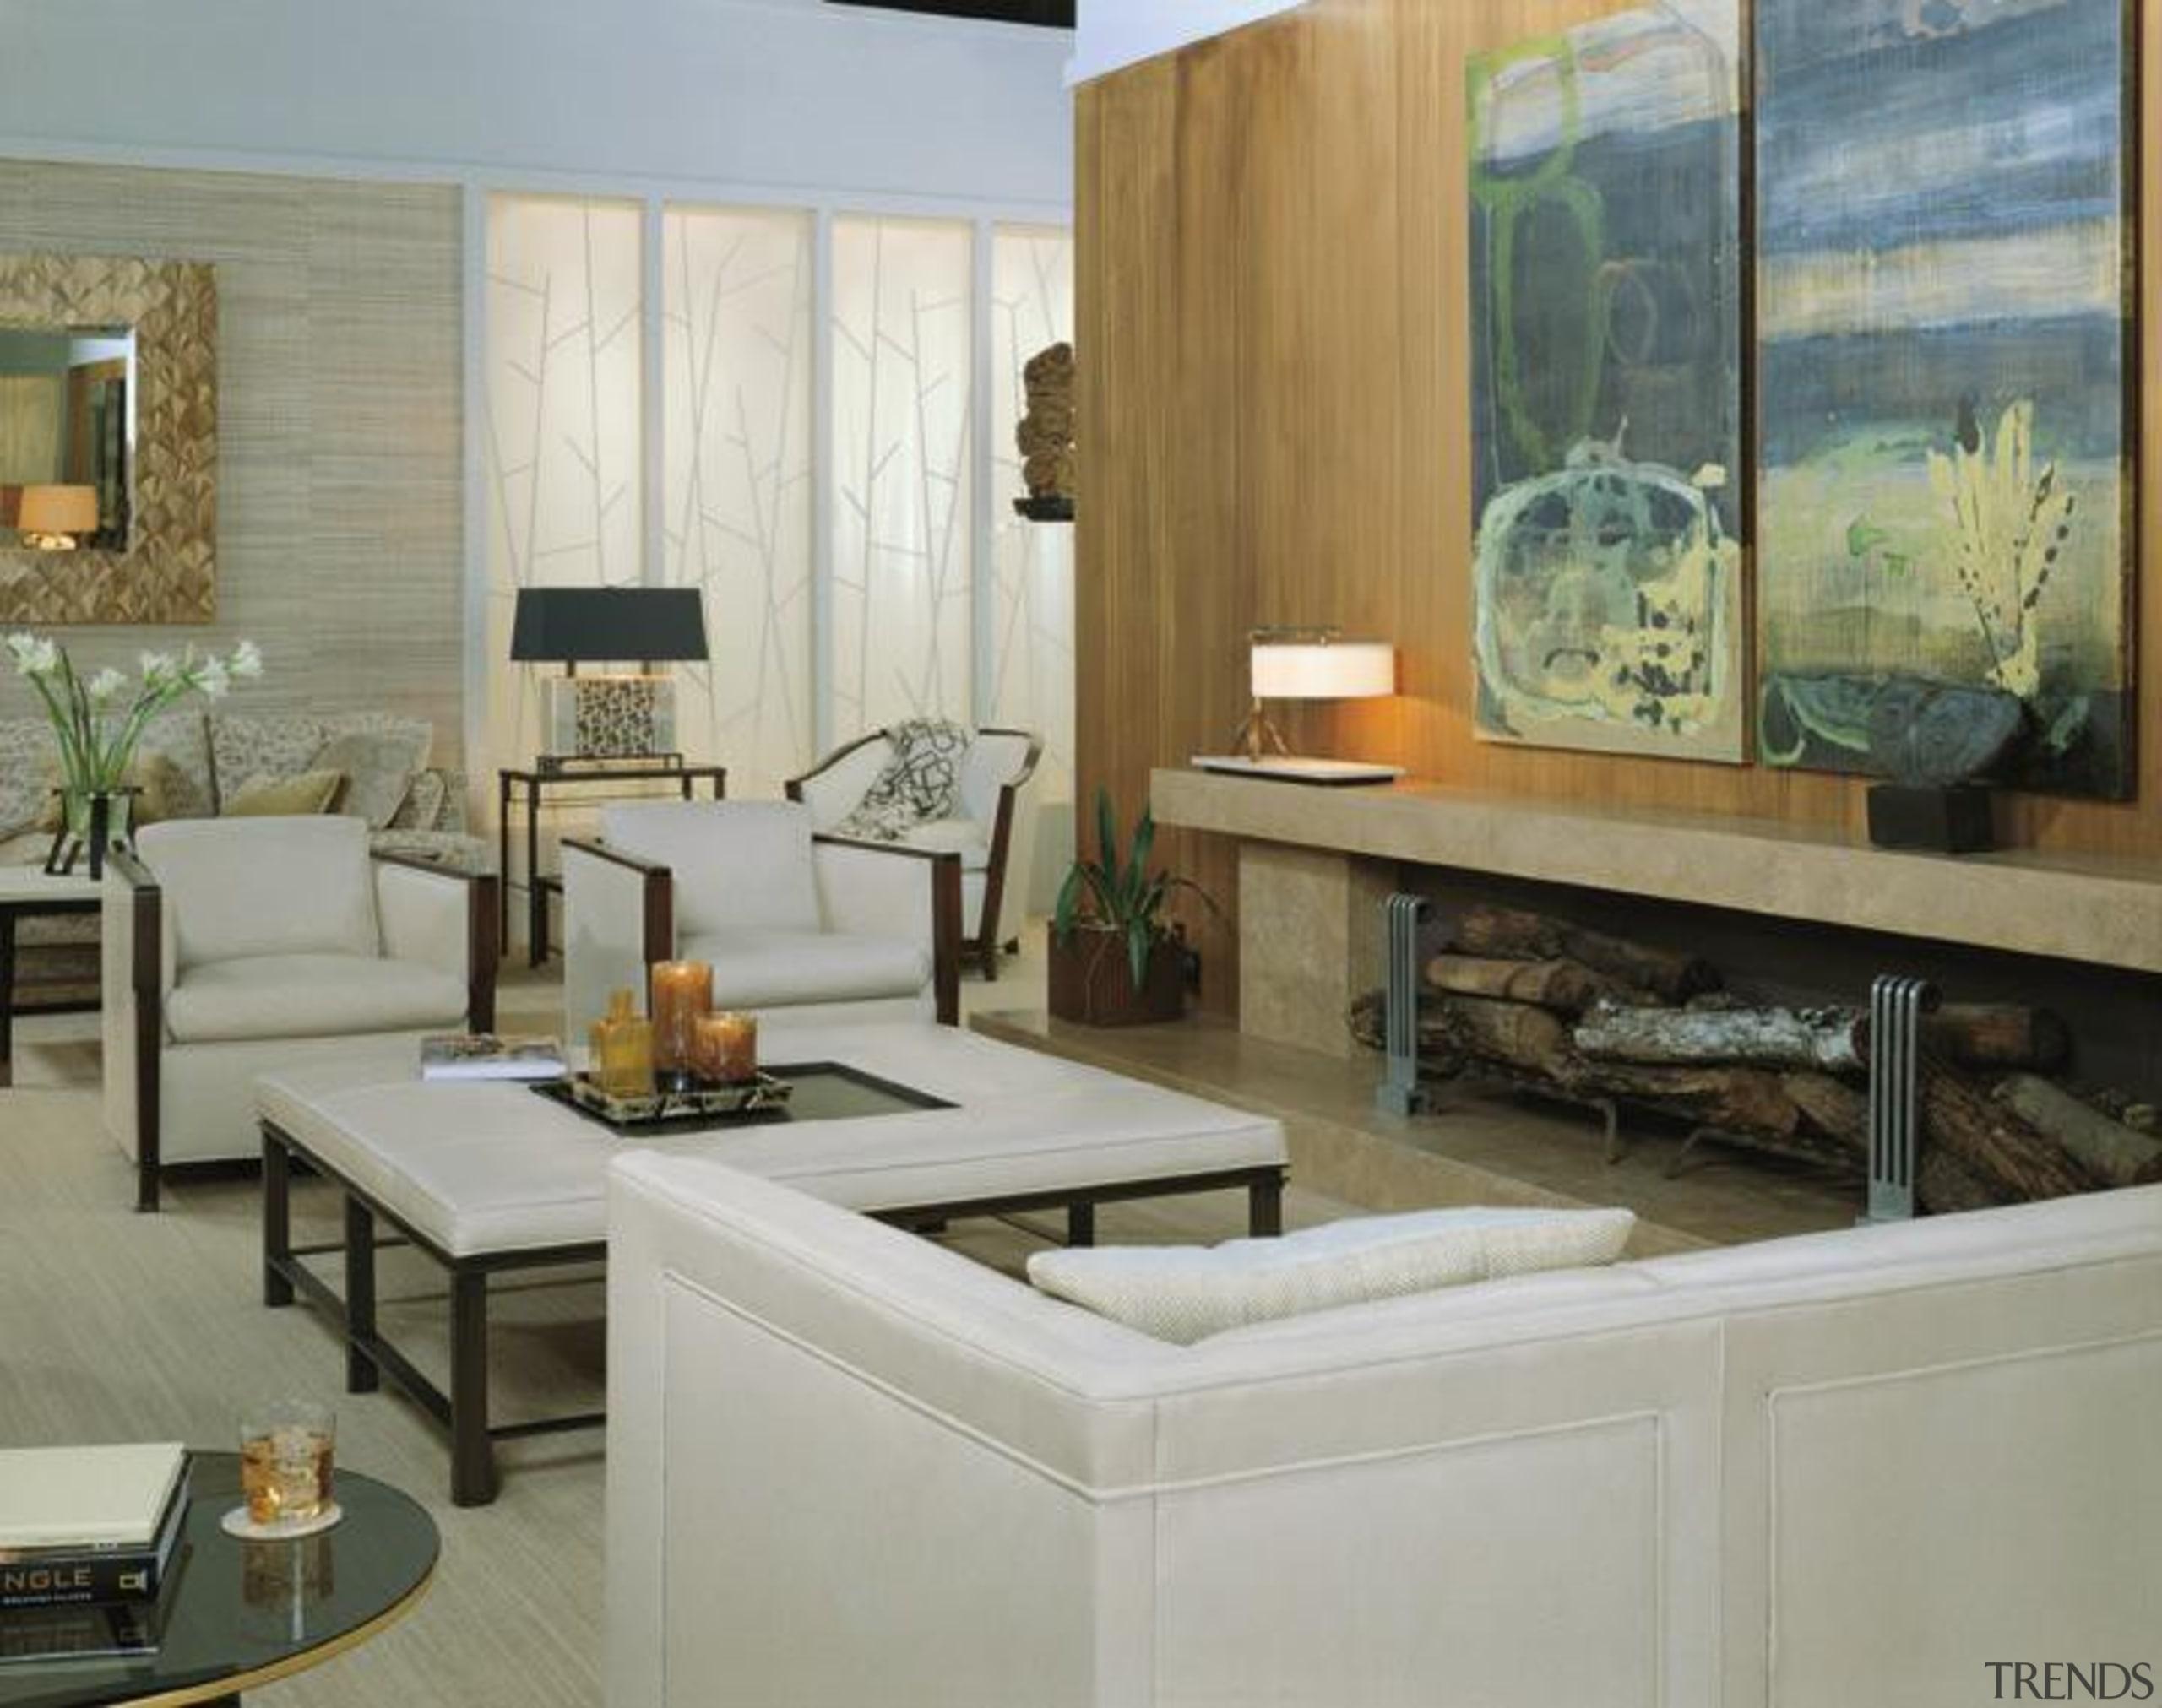 The work of William Sofield is defined not floor, flooring, furniture, interior design, living room, room, gray